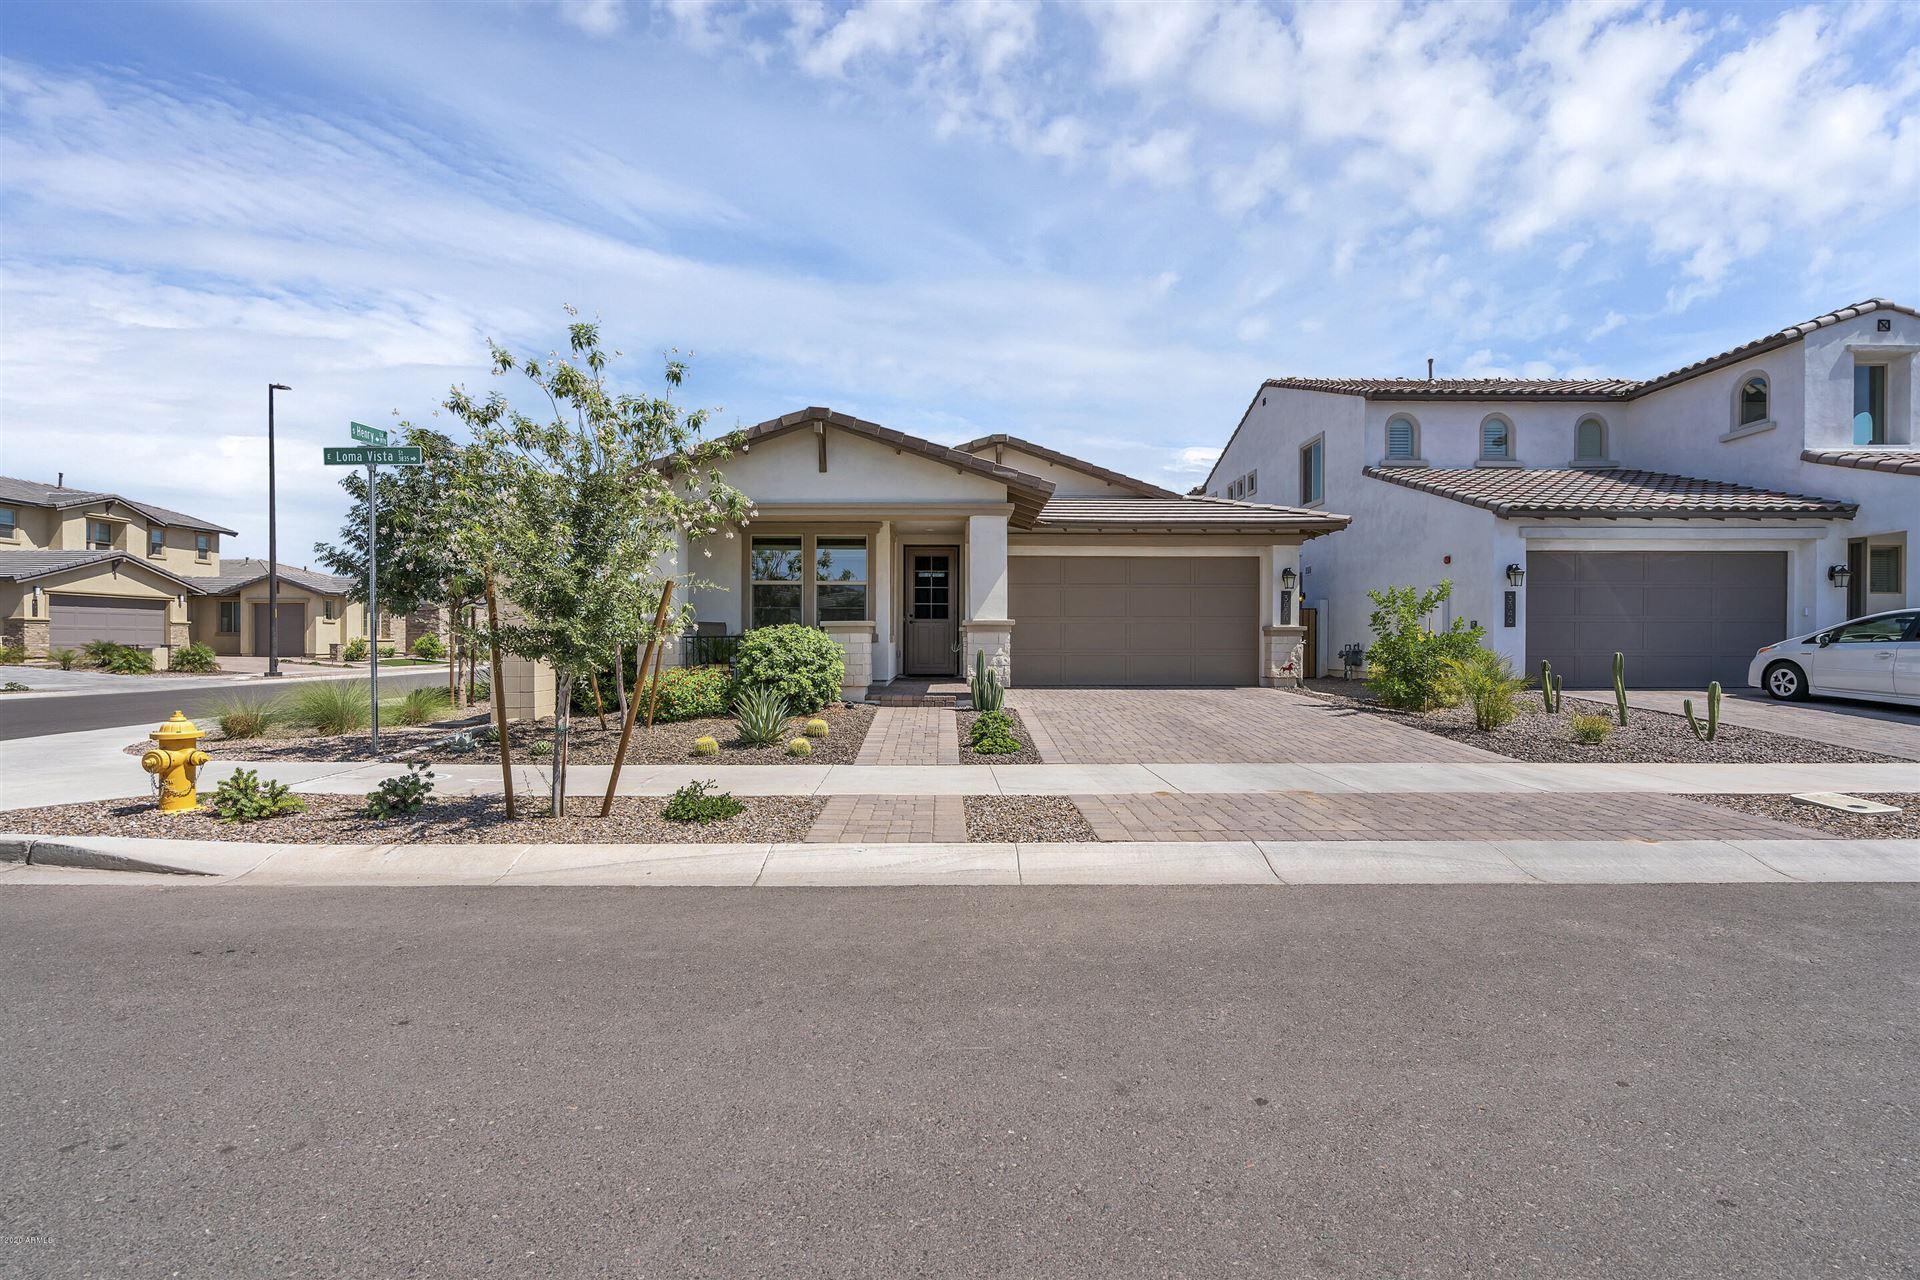 3838 E LOMA VISTA Street, Gilbert, AZ 85295 - #: 6090227